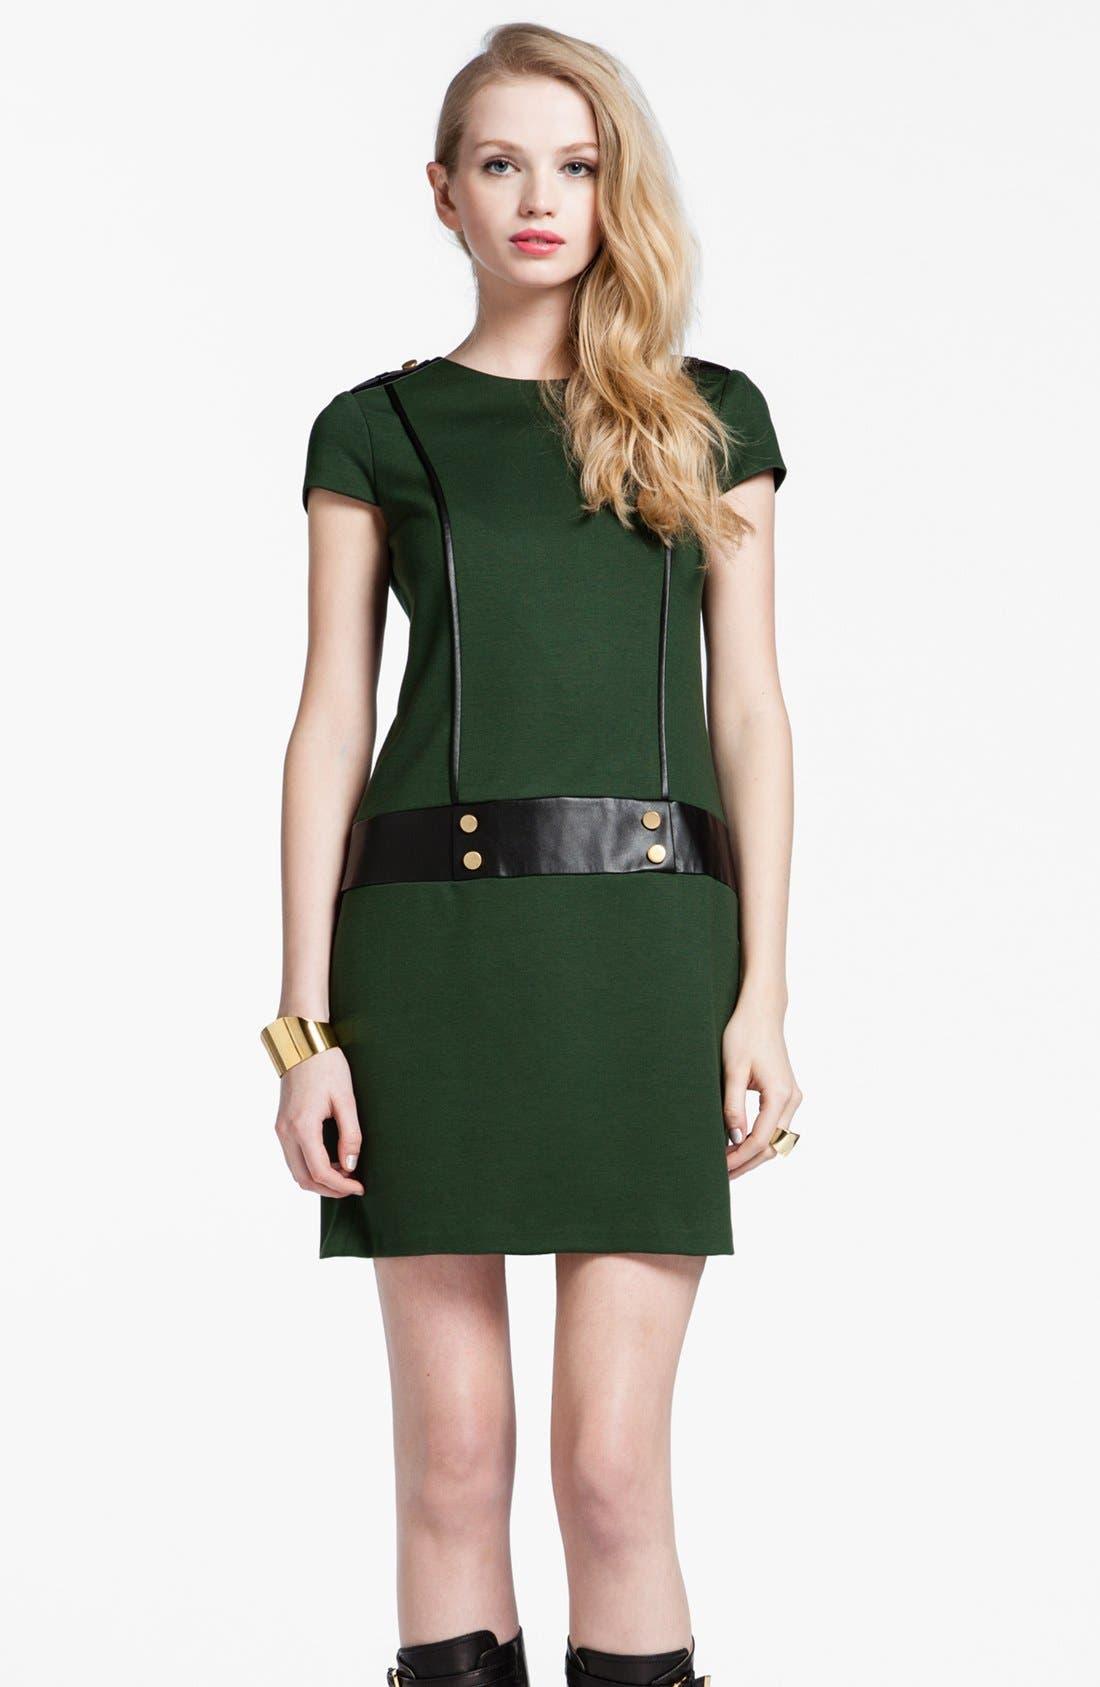 Main Image - Cynthia Steffe 'Perla' Faux Leather Trim Shift Dress